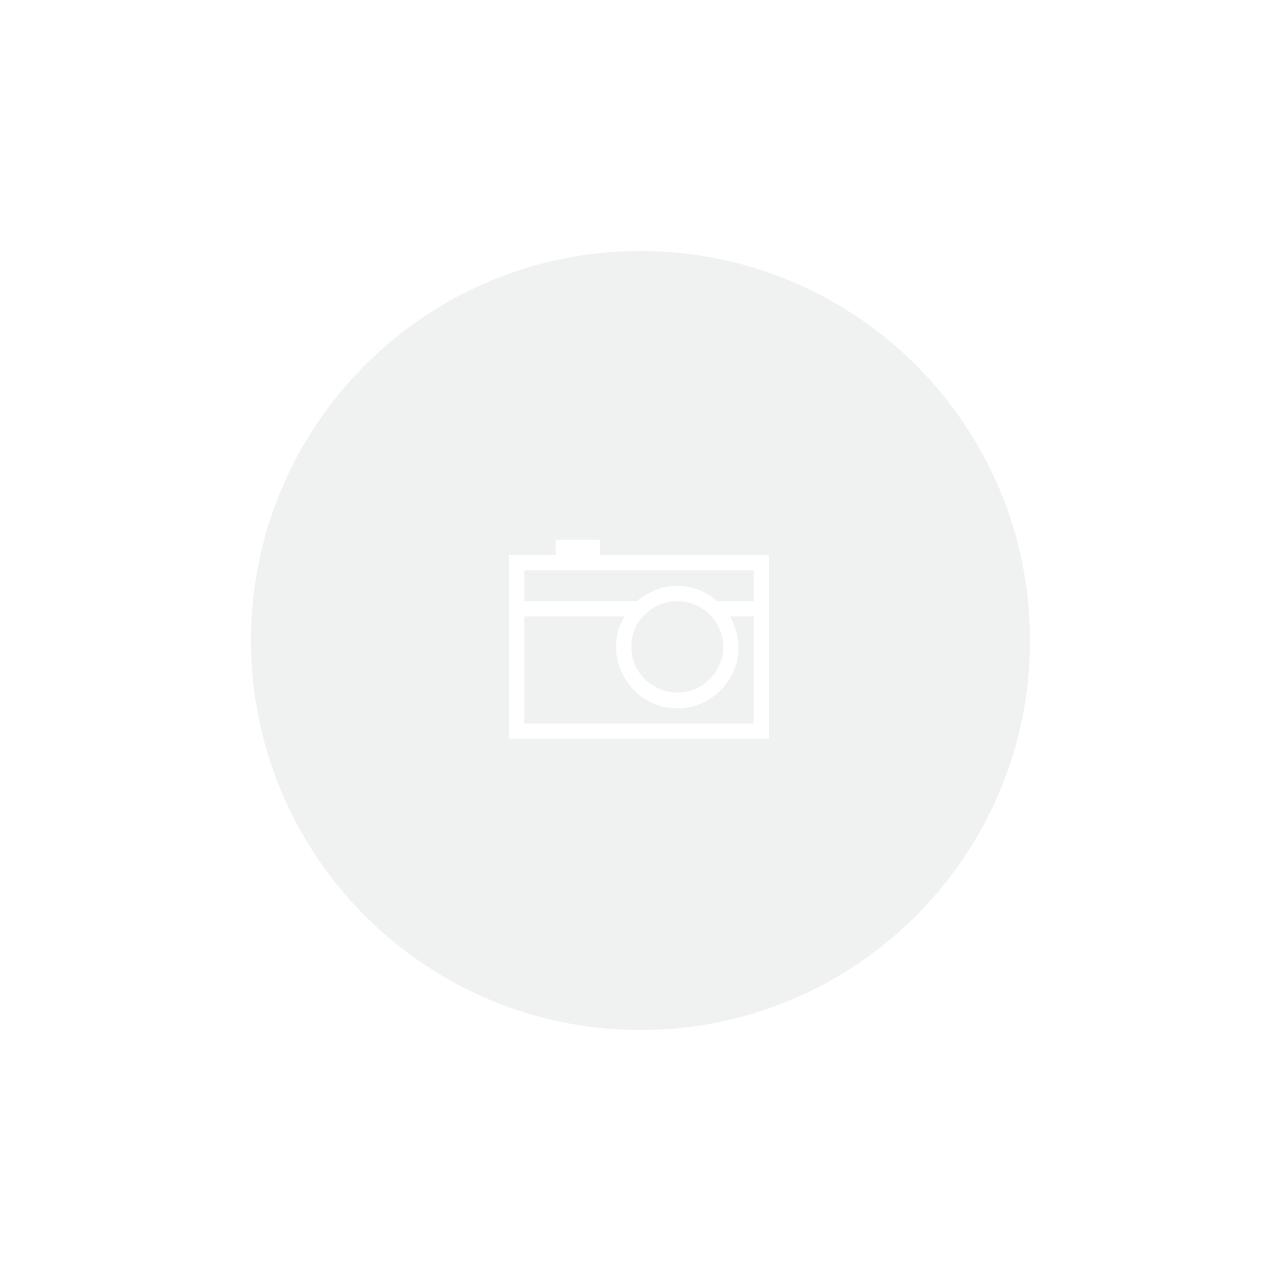 Papel Artesanal Indiano - Ref. 35